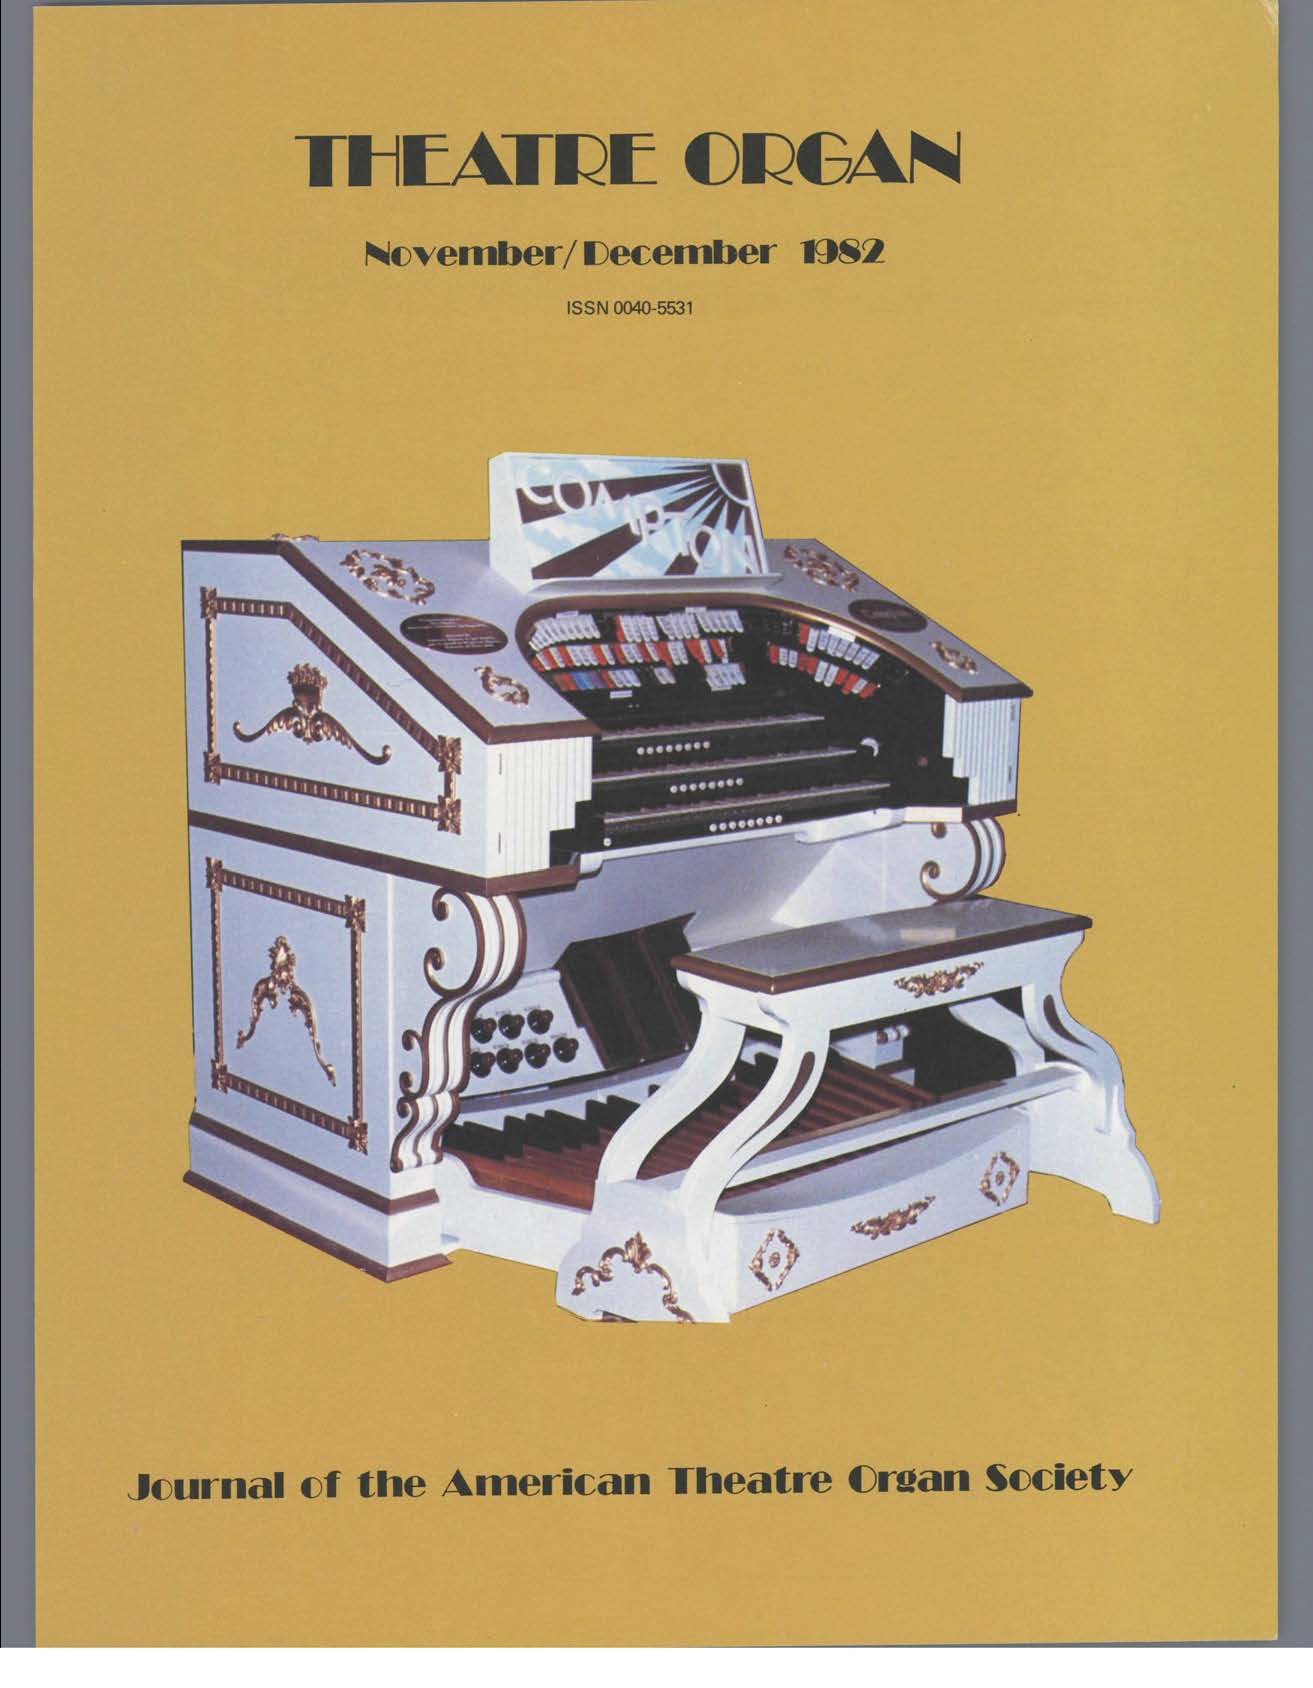 Theatre Organ, November - December 1982, Volume 24, Number 6